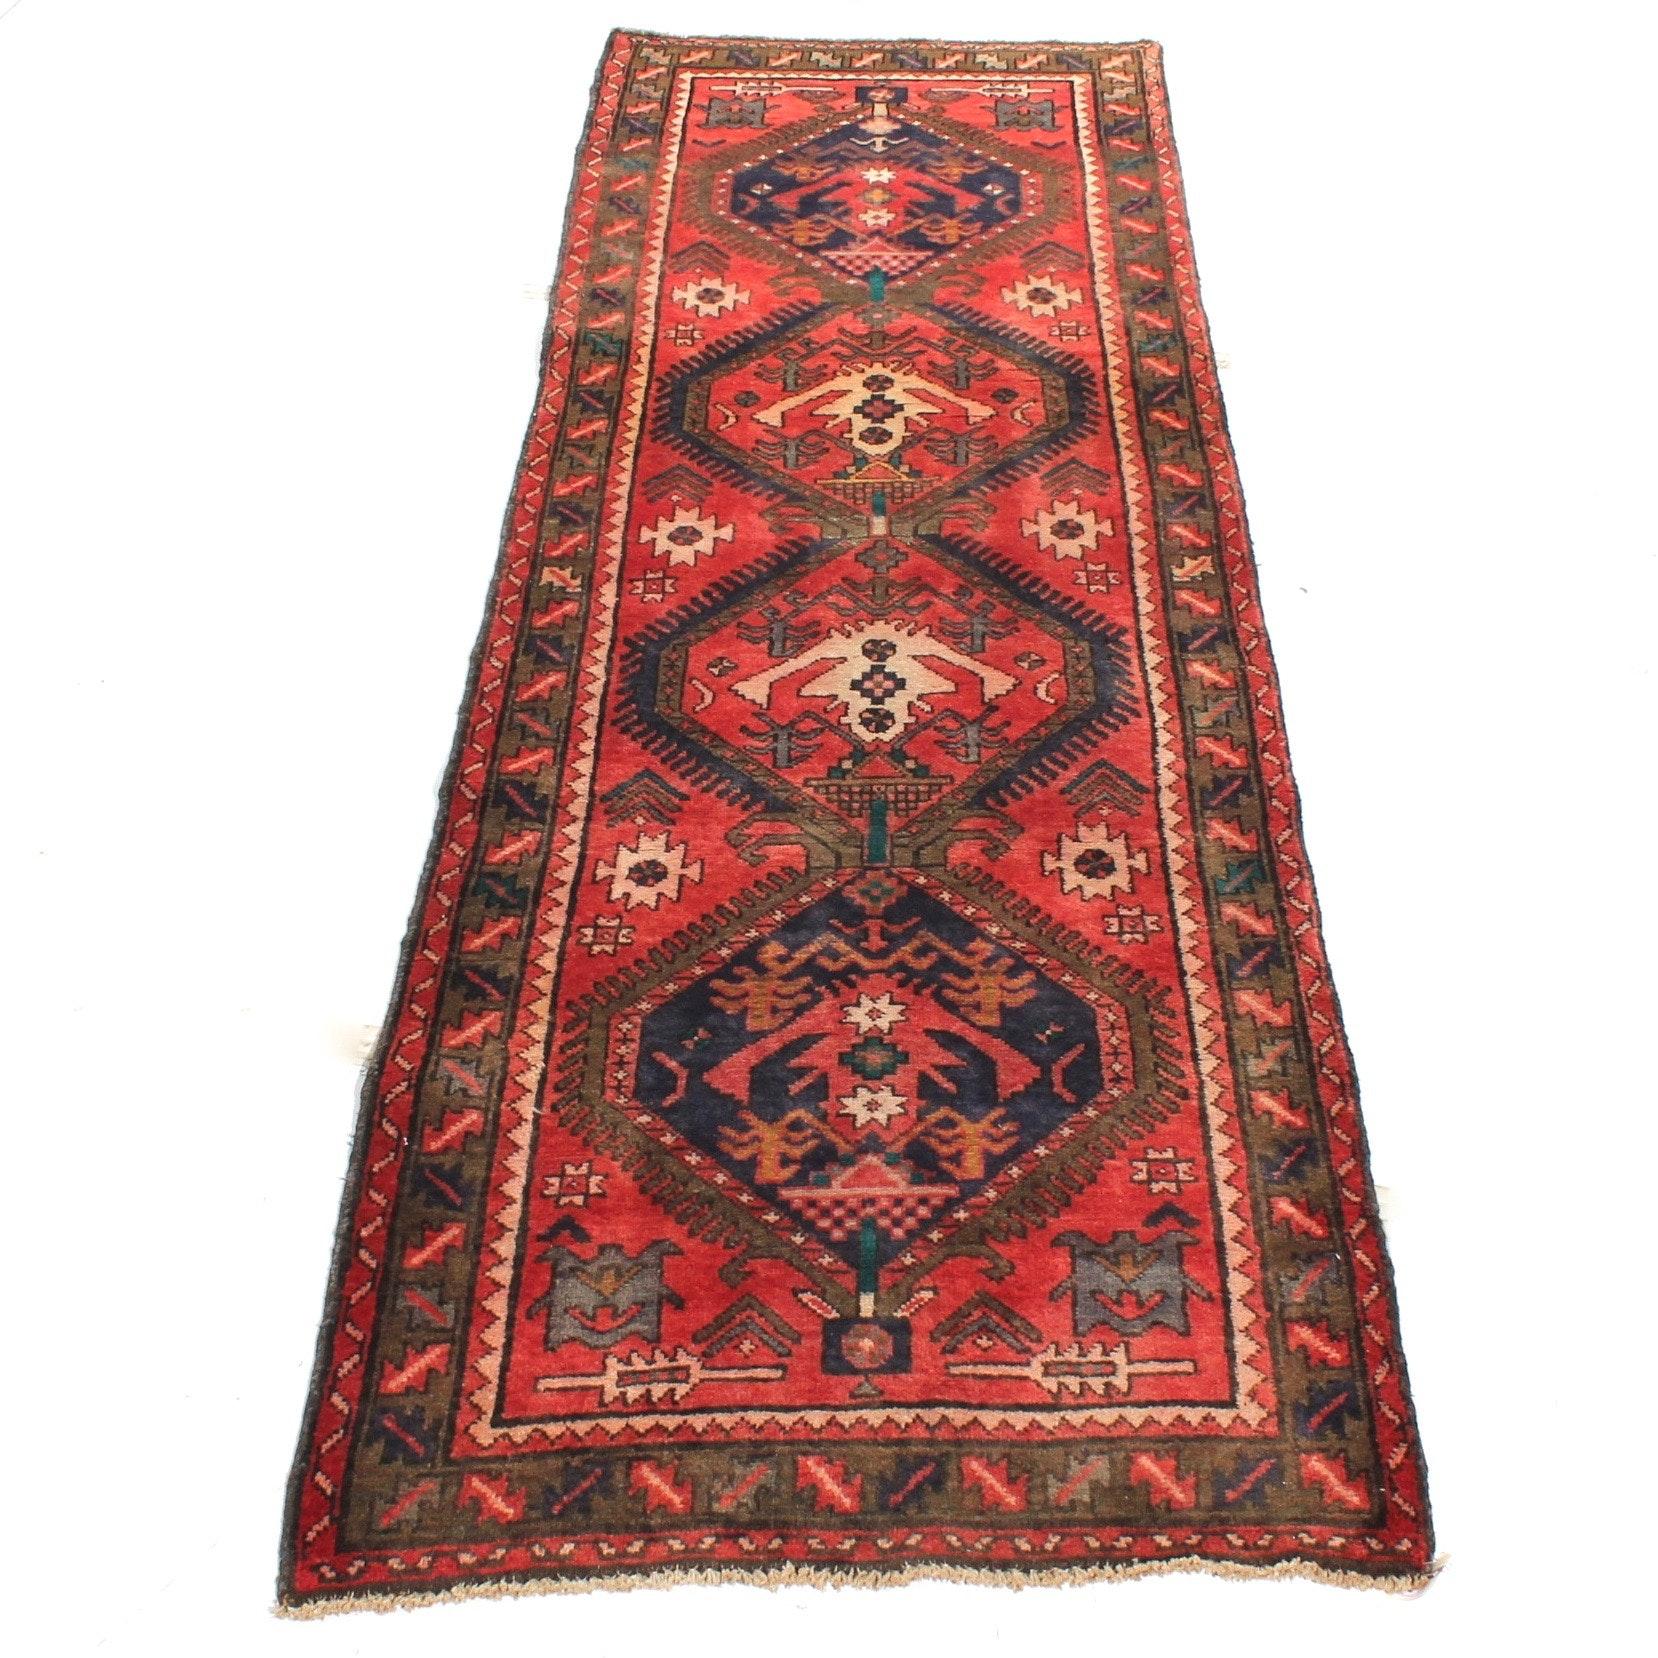 3'2 x 10'2 Vintage Hand-Knotted Persian Karaja Heriz Rug